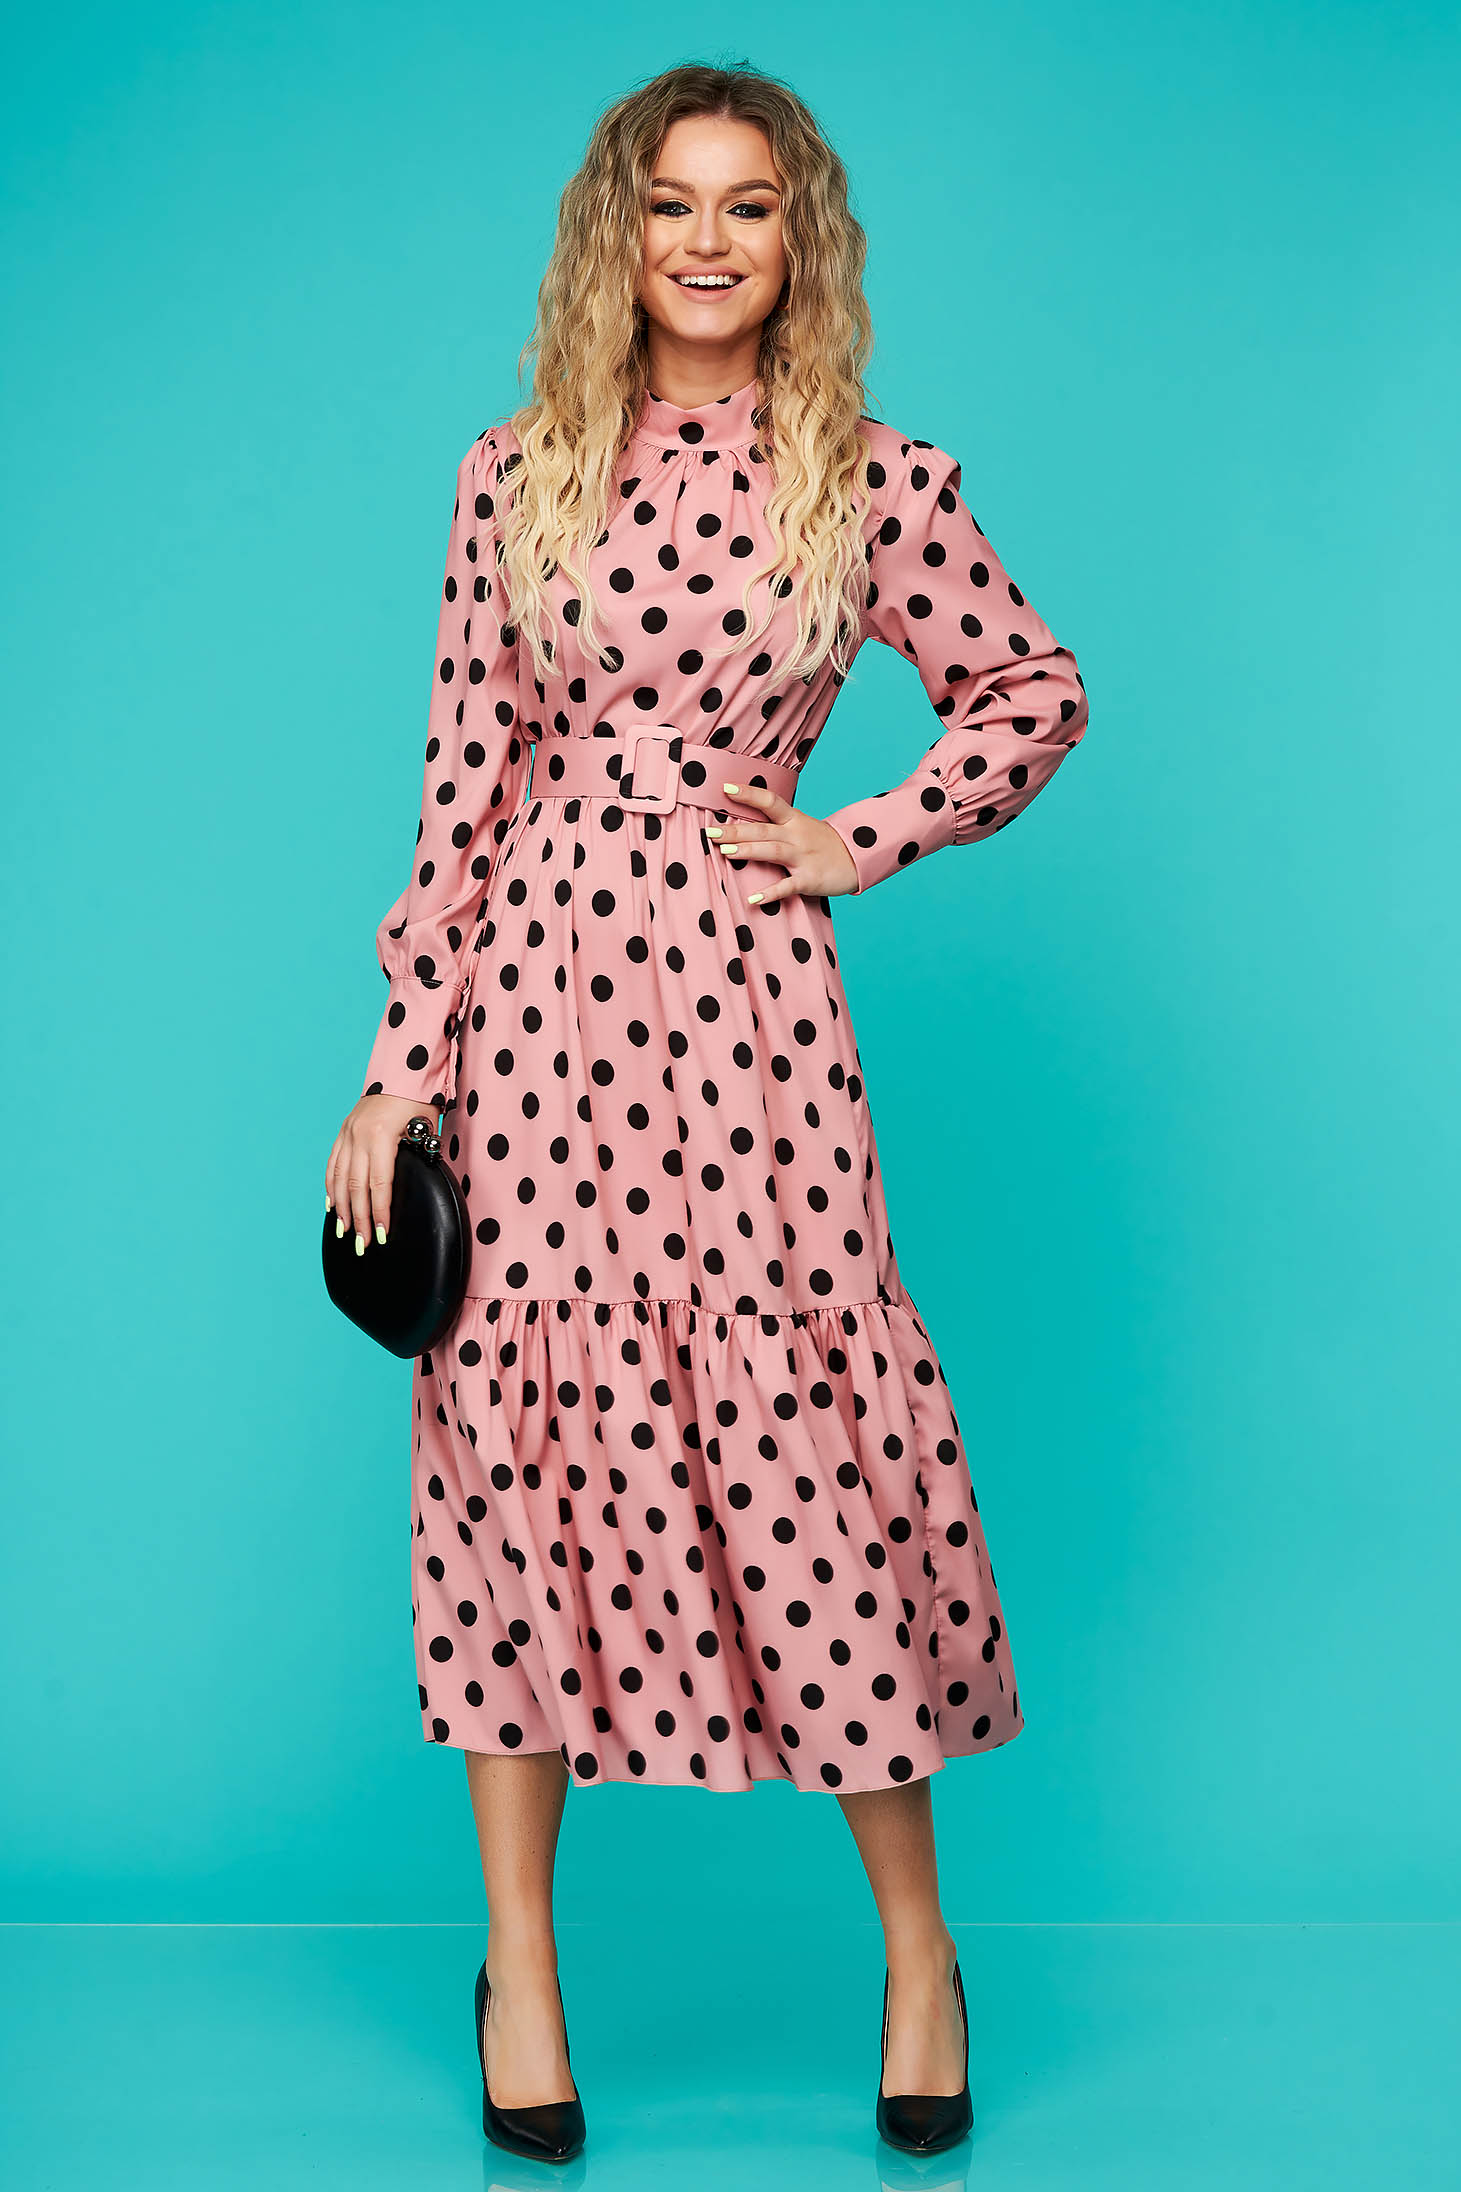 Rochie SunShine roz de zi midi cu elastic in talie cu accesoriu tip curea cu volanase la baza rochiei